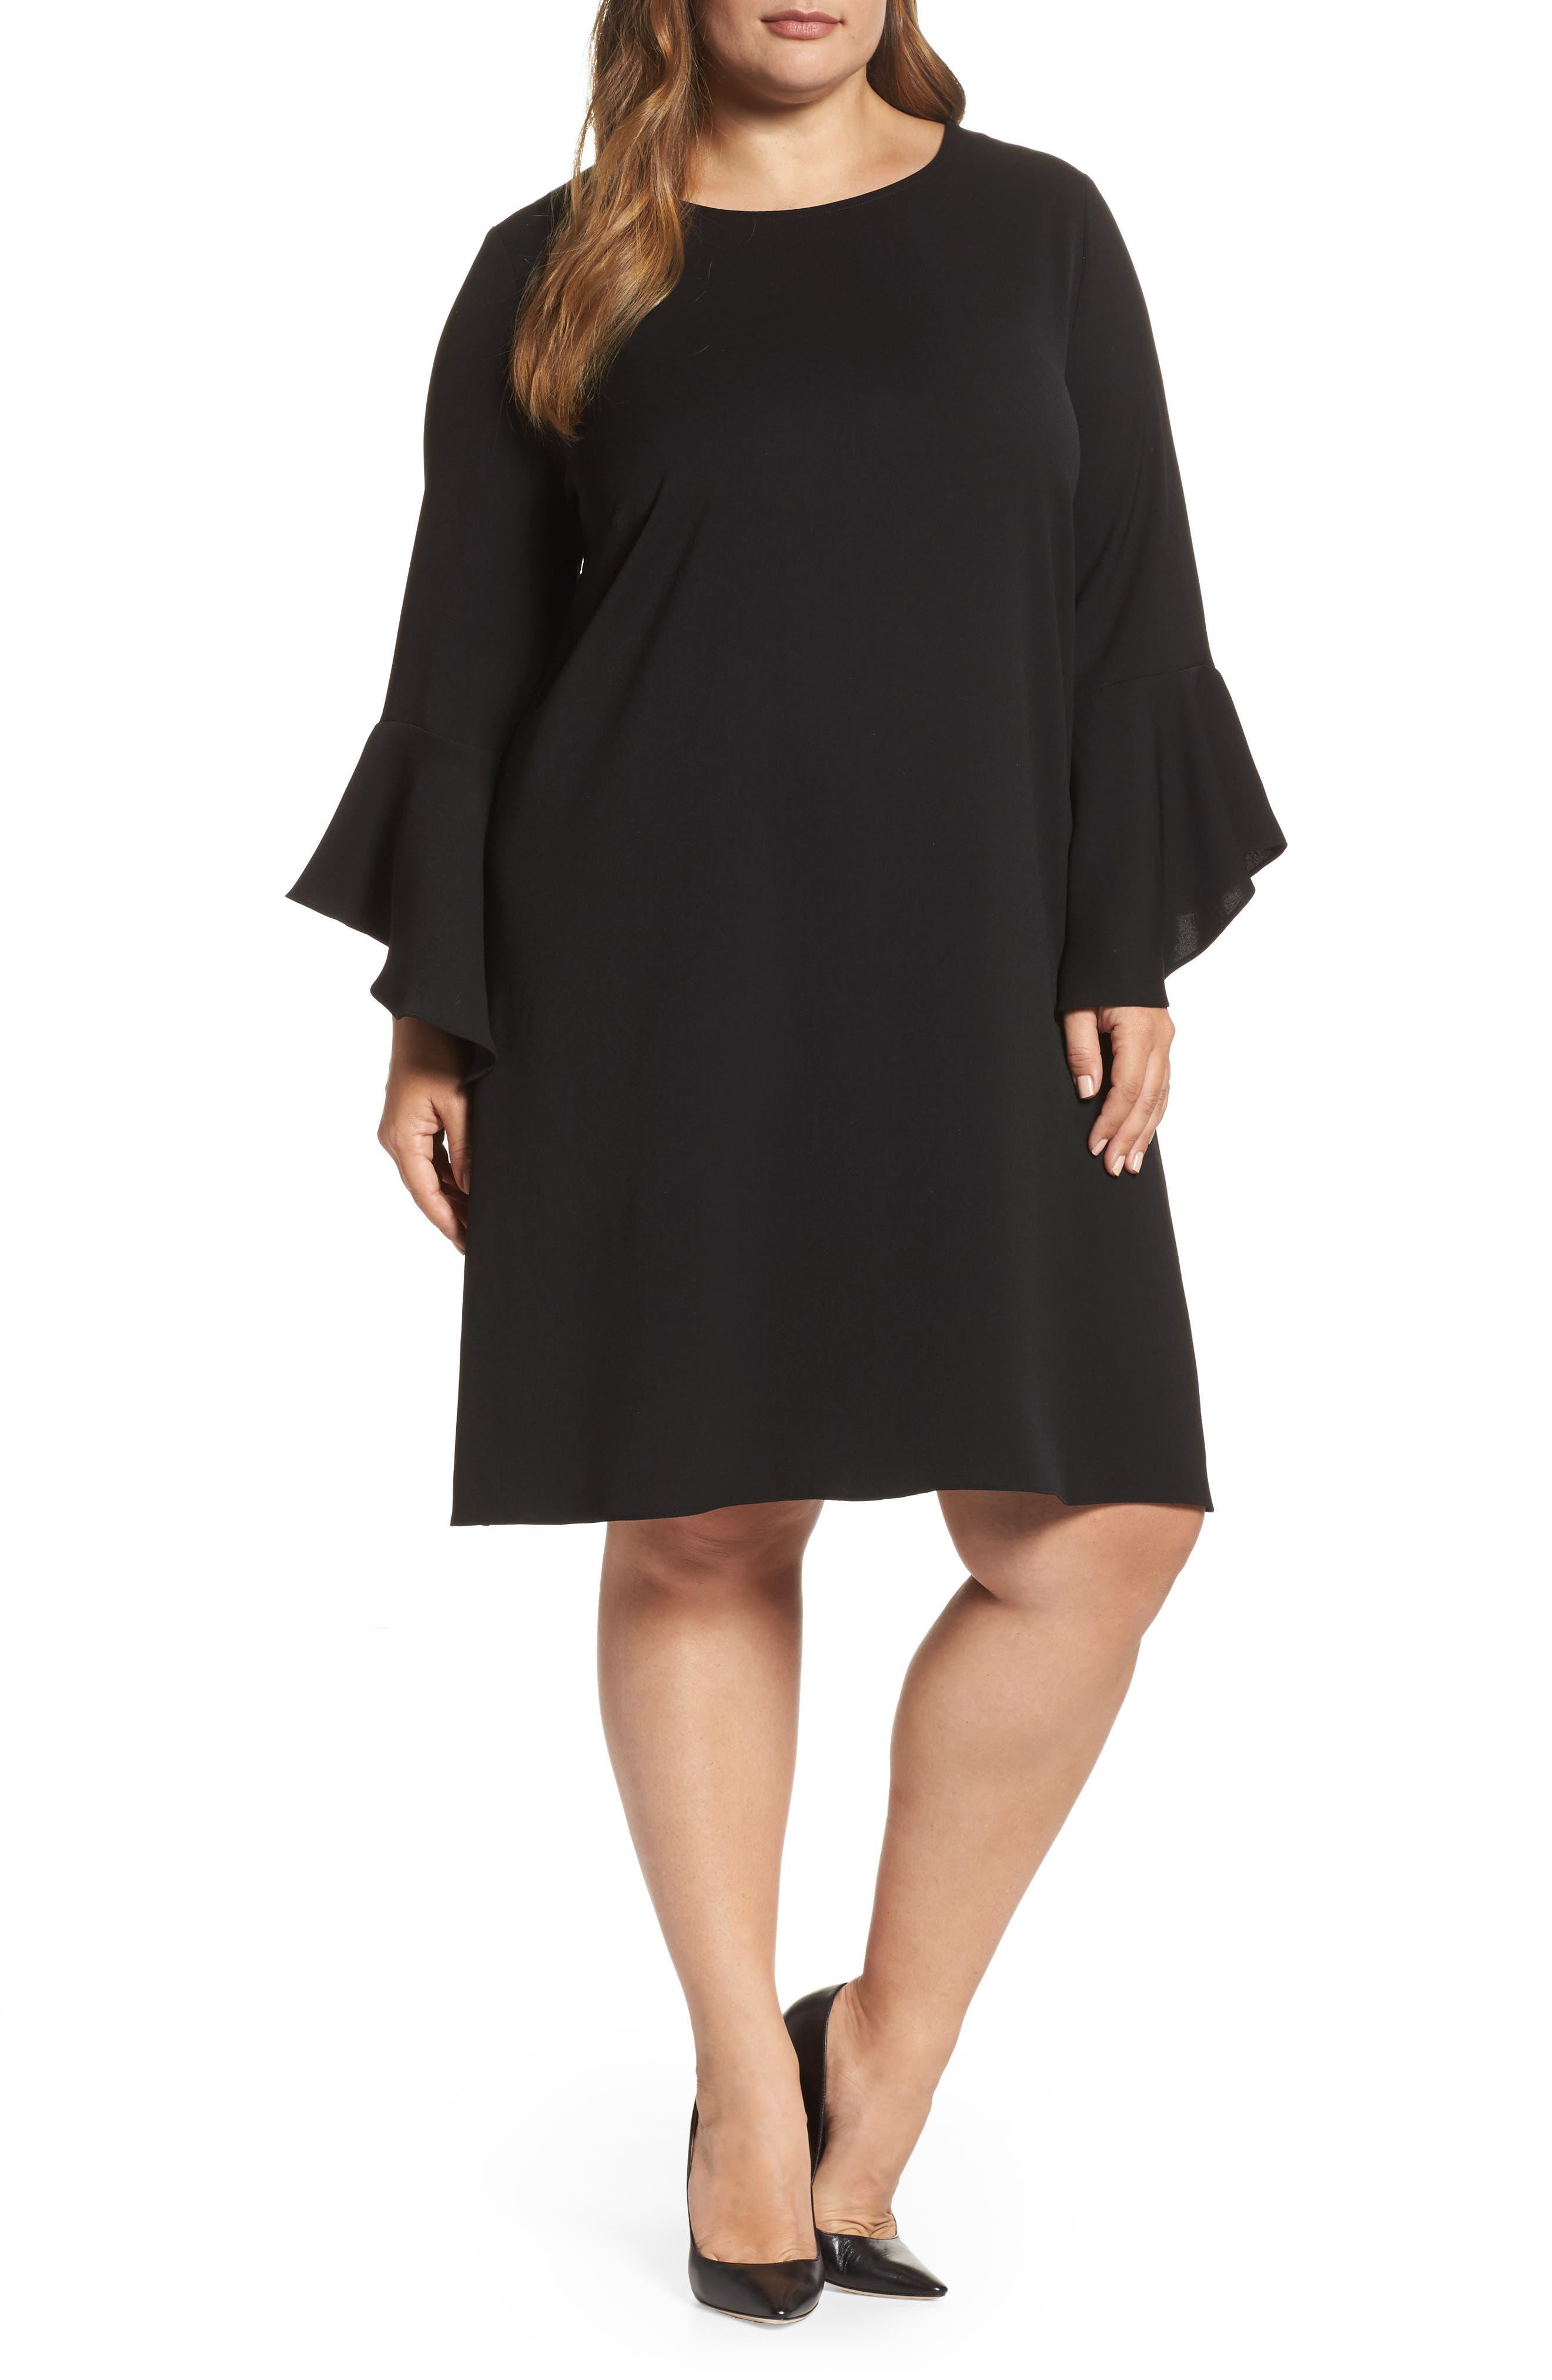 Alternate Image 1 Selected - Glamorous Bell Sleeve Shift Dress (Plus Size)